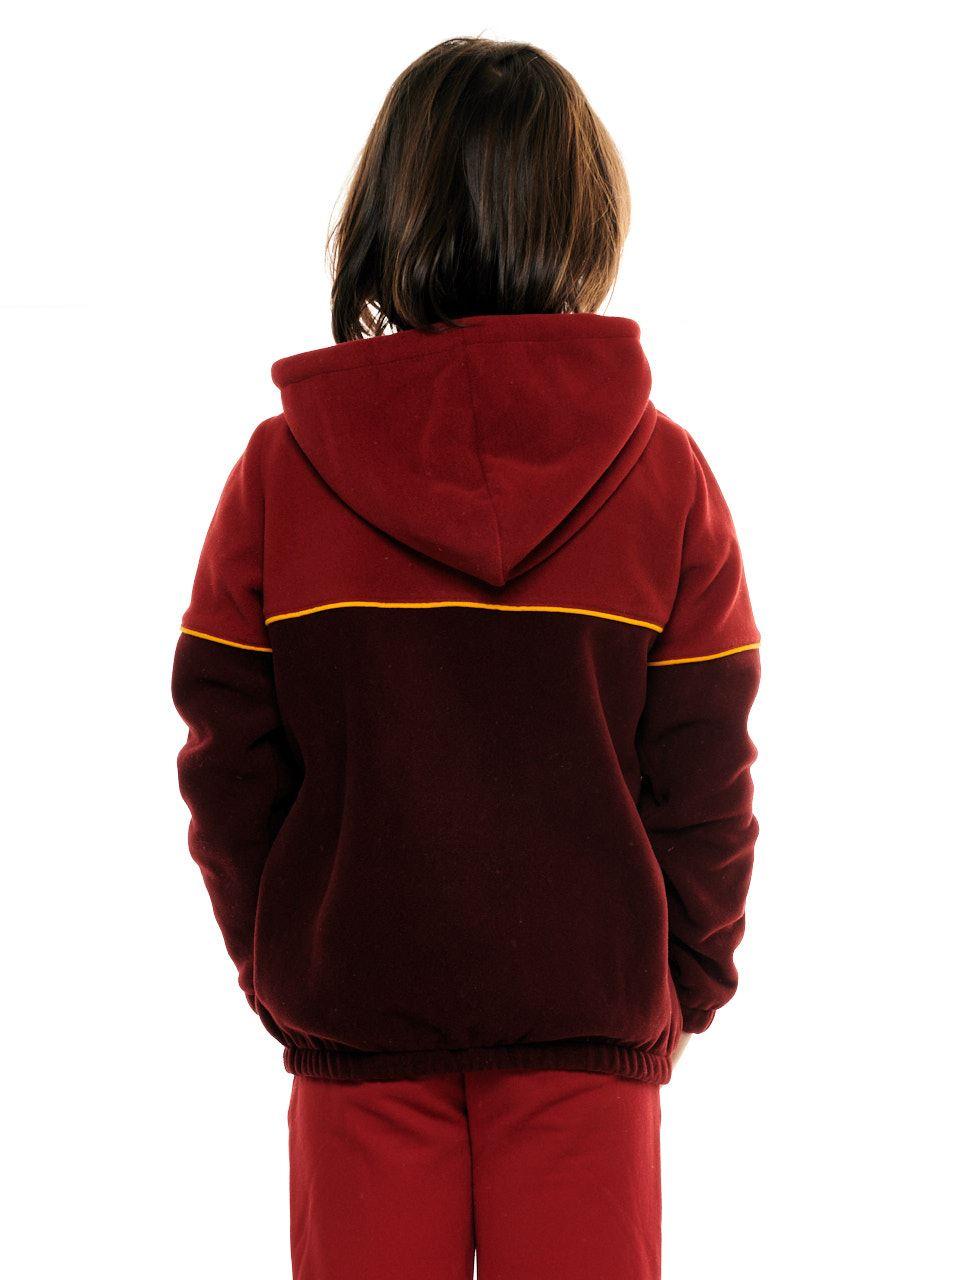 Galatasaray Çocuk Sweatshirt C202056